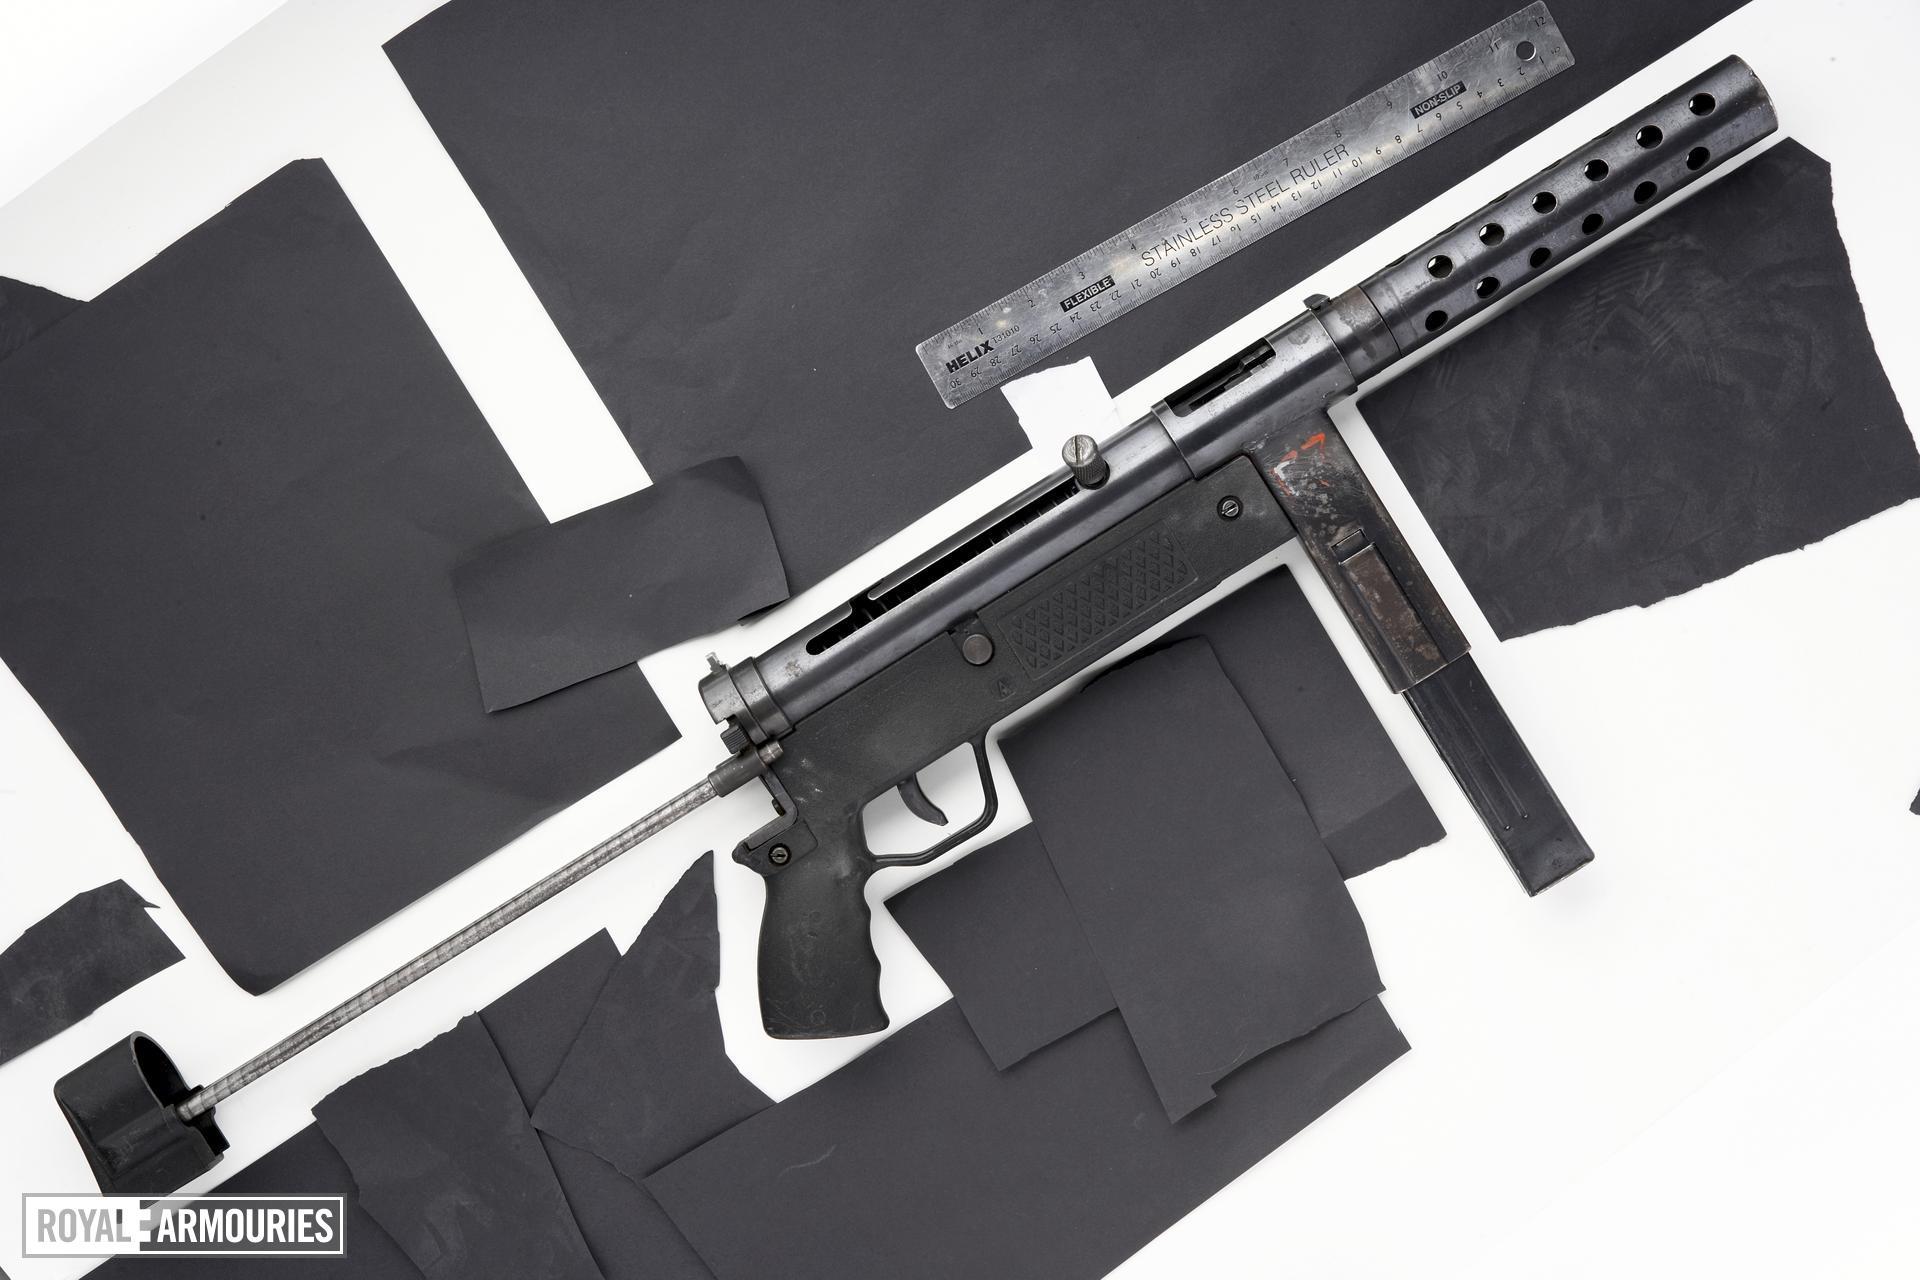 Centrefire automatic submachine gun - Zagi M91